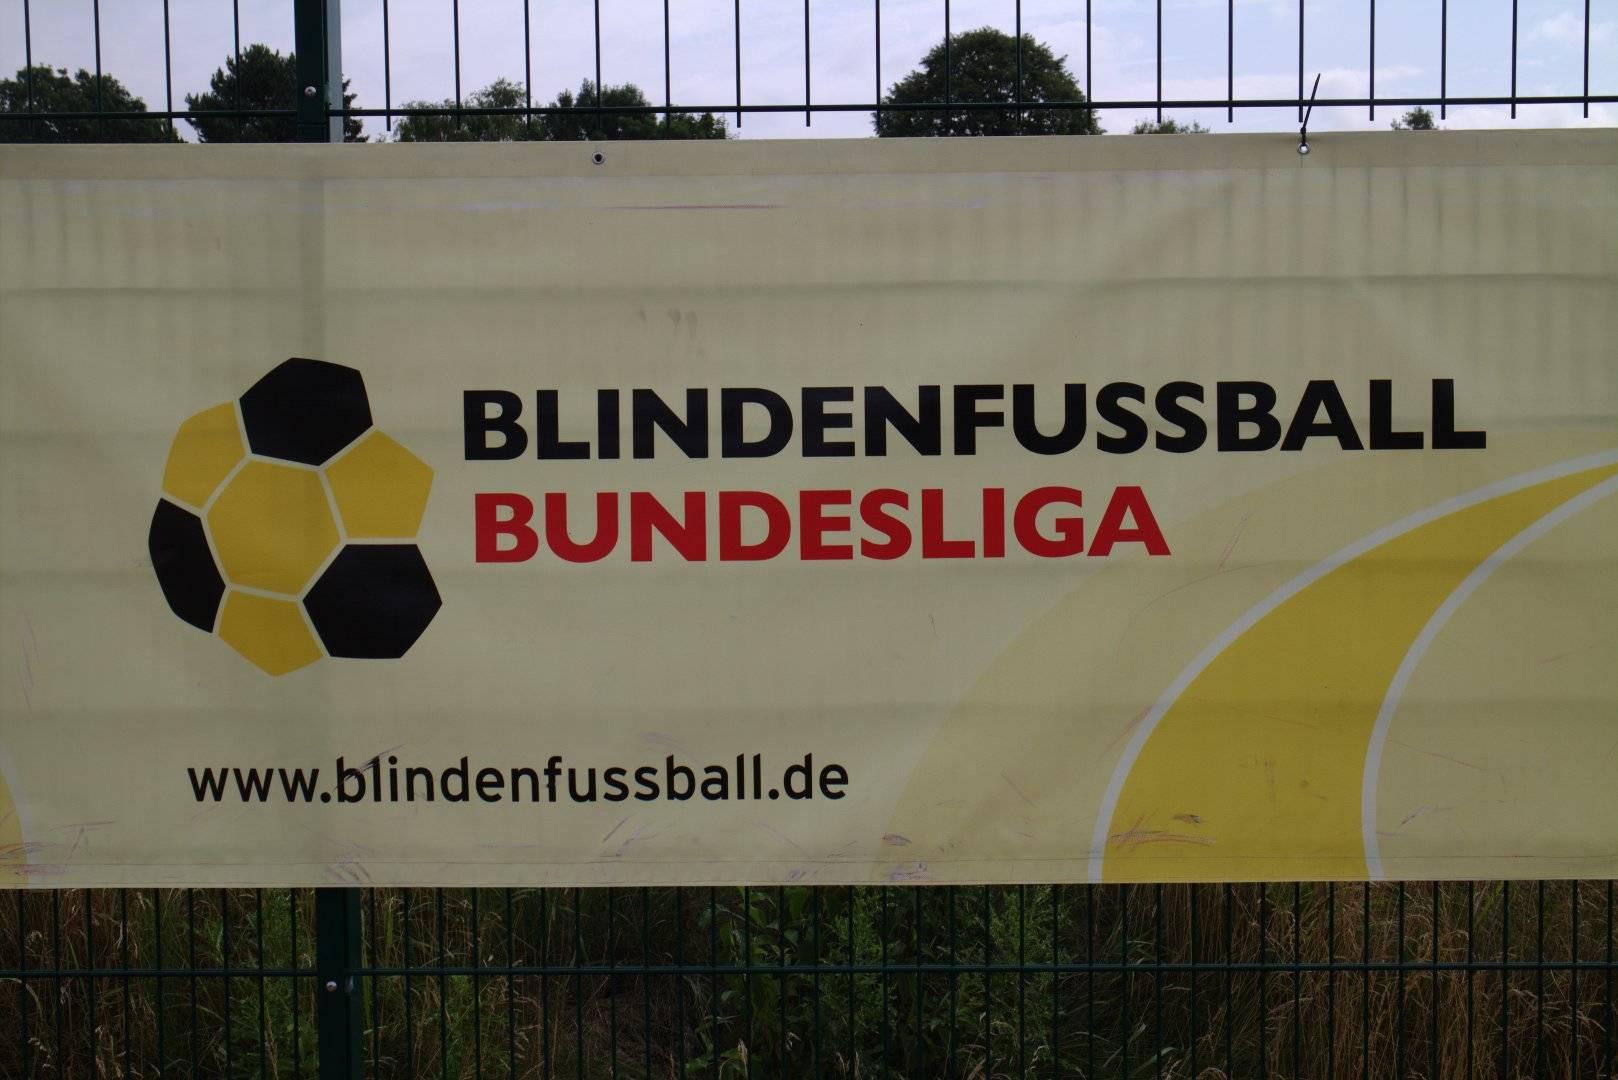 Blindenfußball Bundesliga Banner